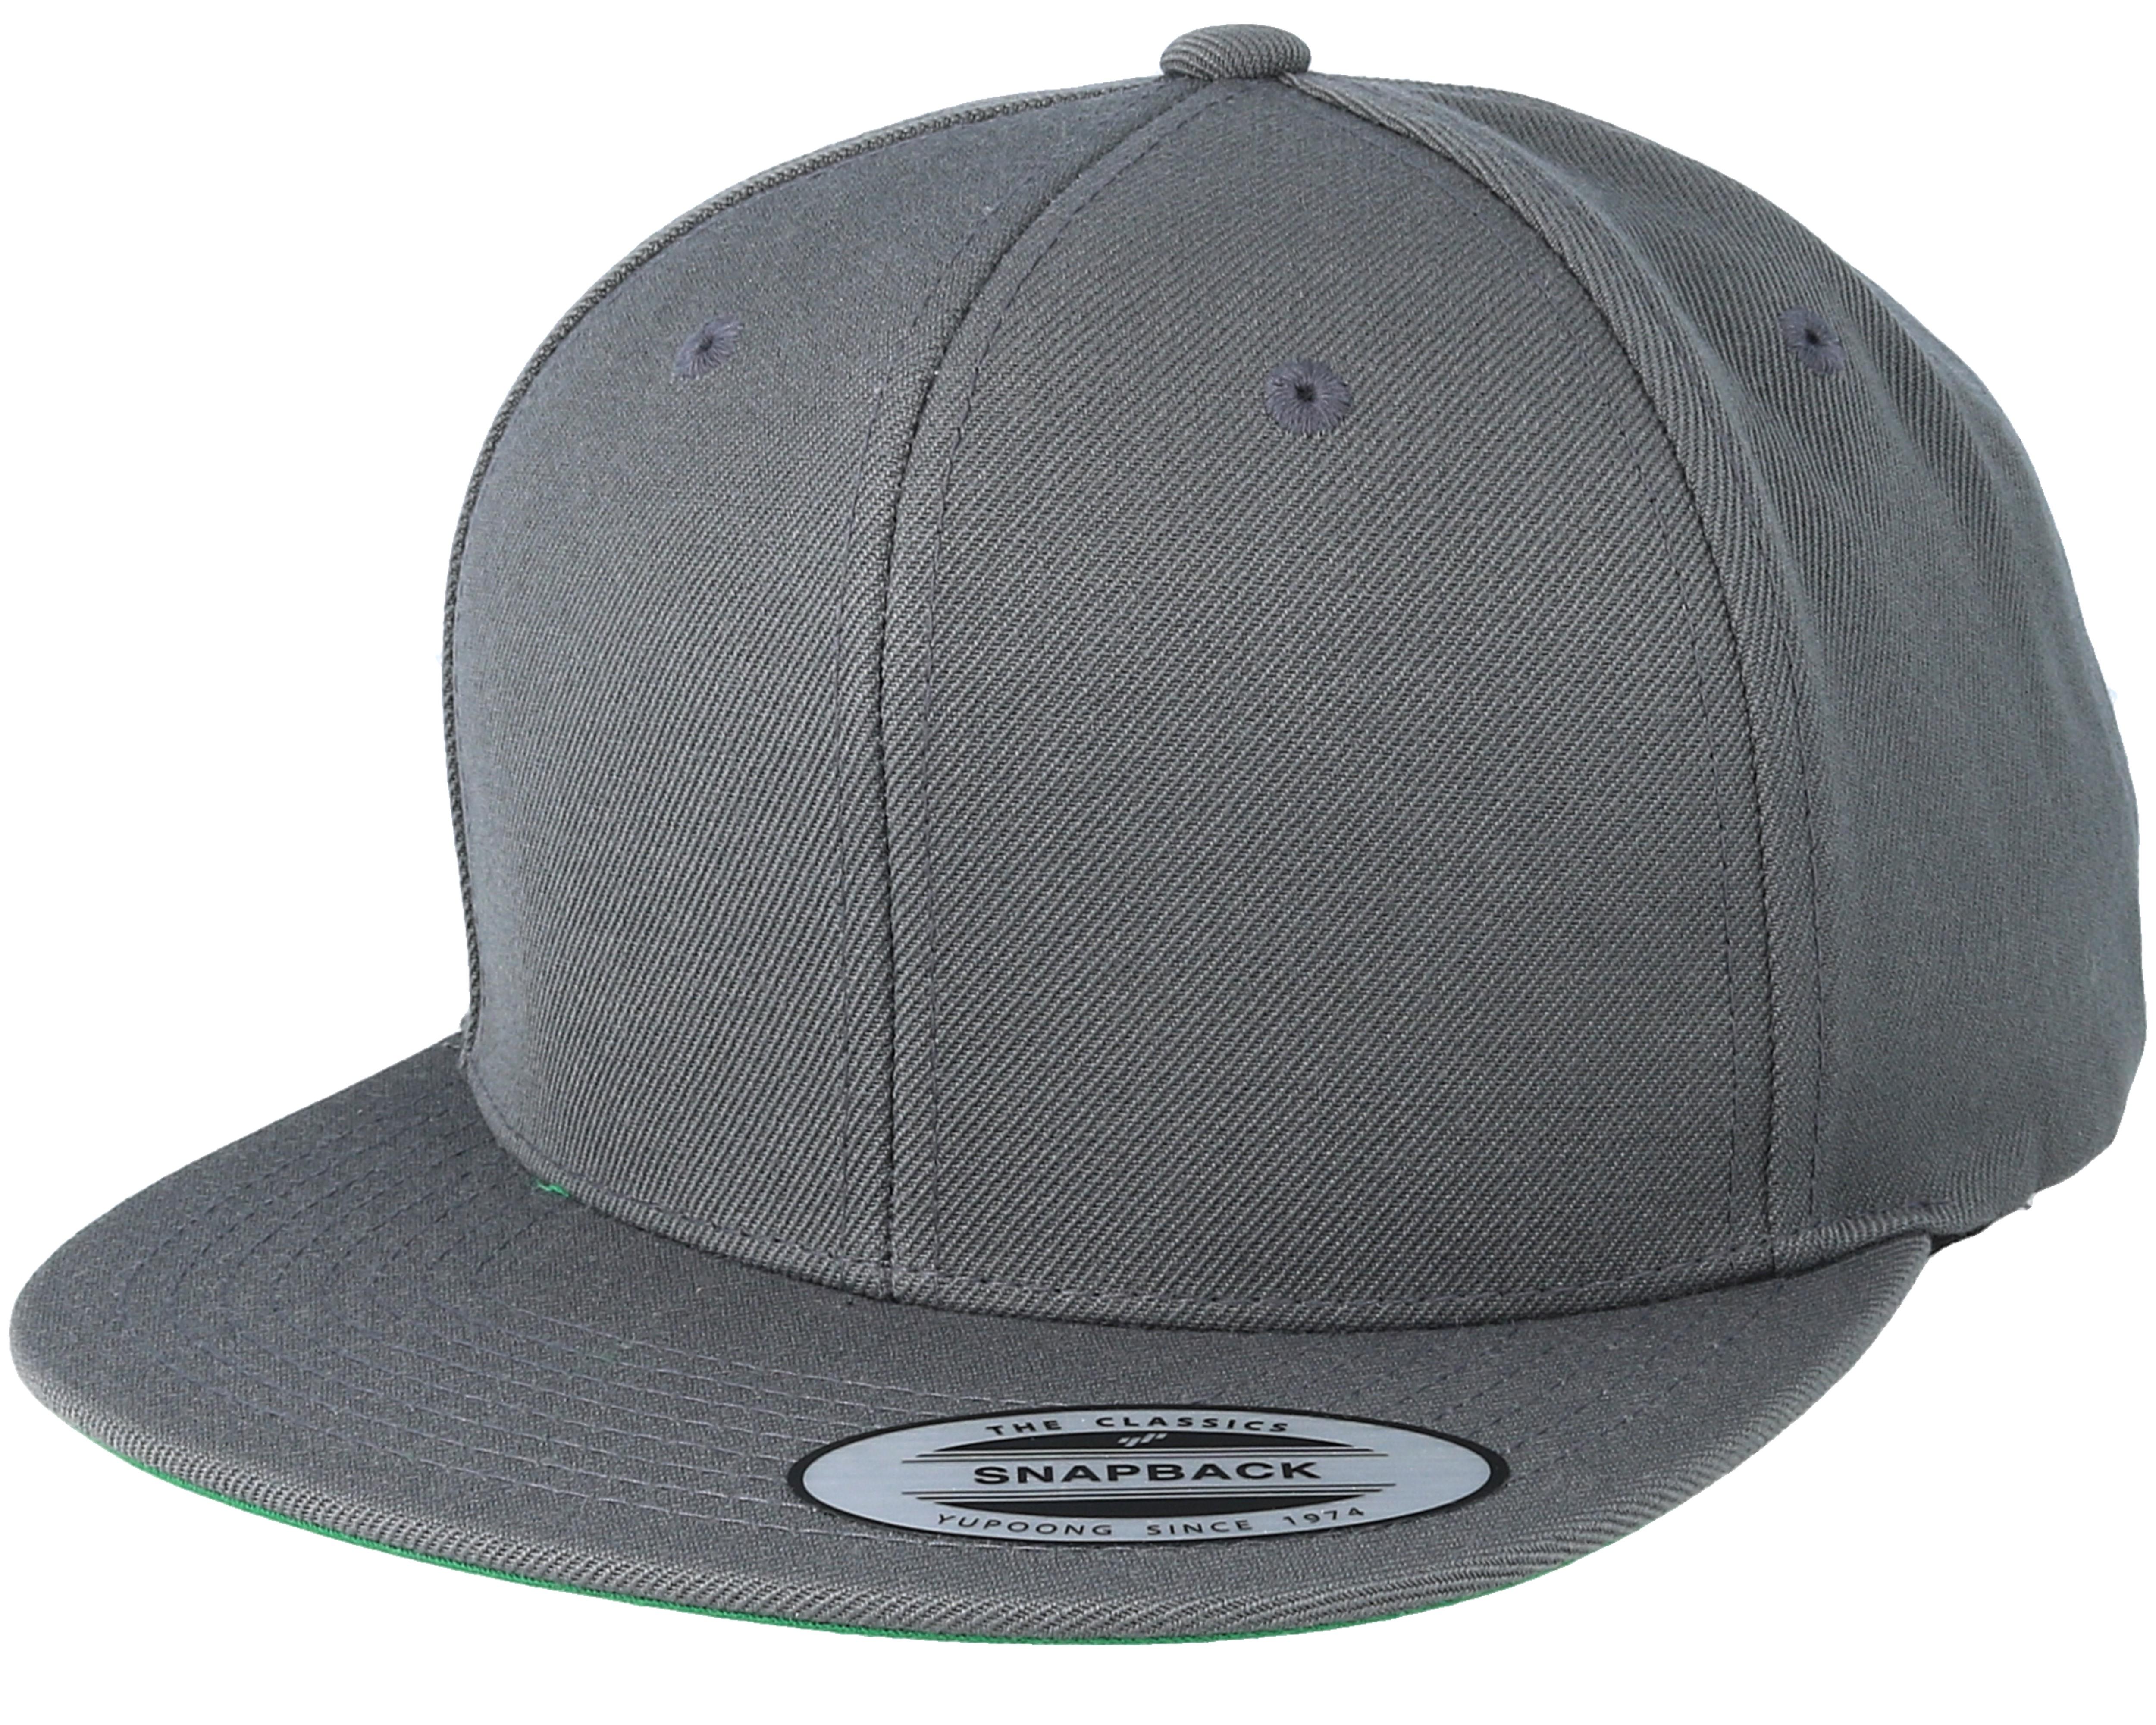 Dark Grey Snapback Yupoong Caps Hatstore Co Uk